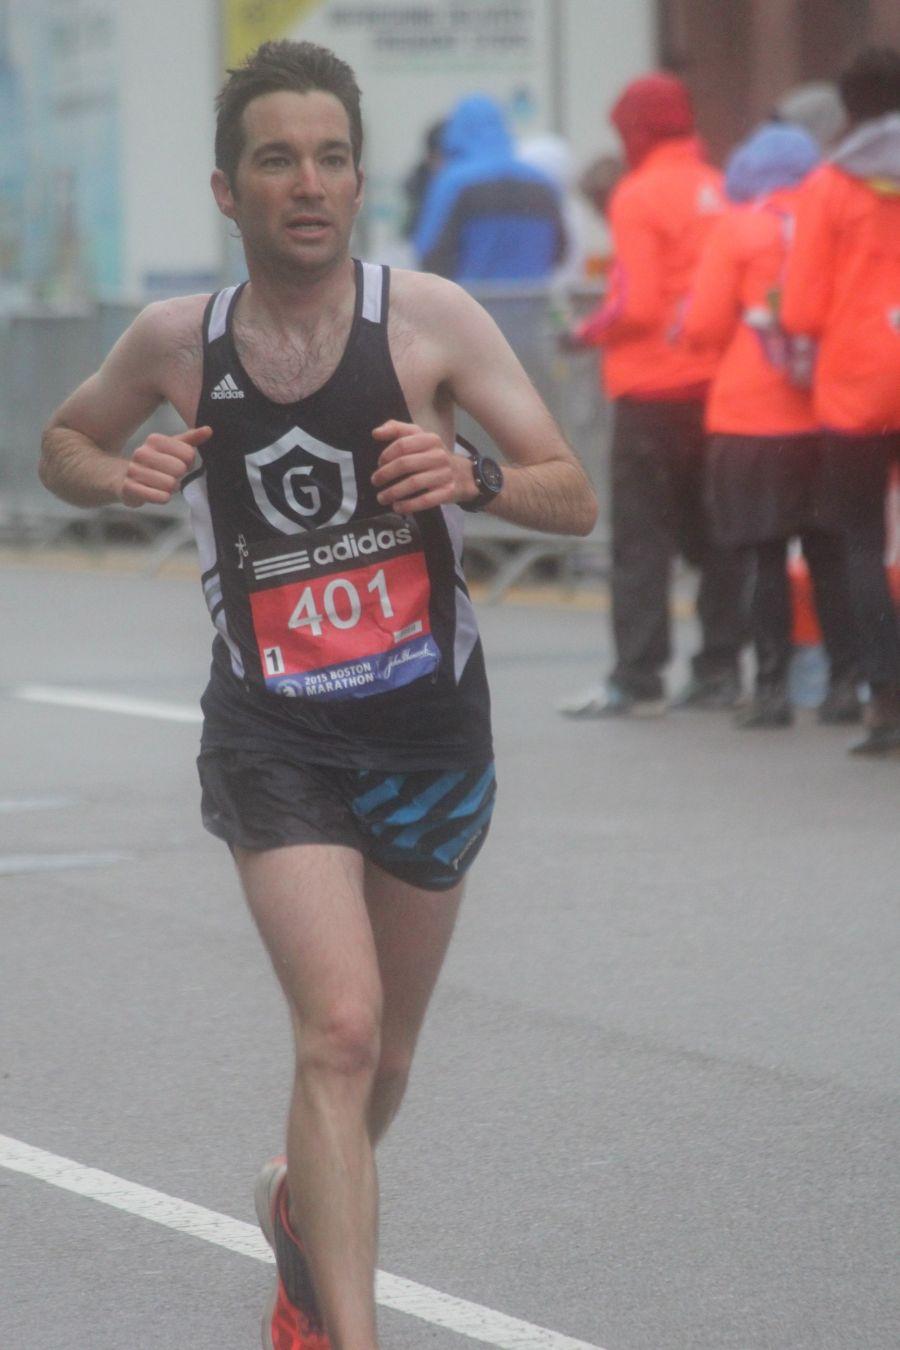 boston marathon april 20 2015 racer number 401